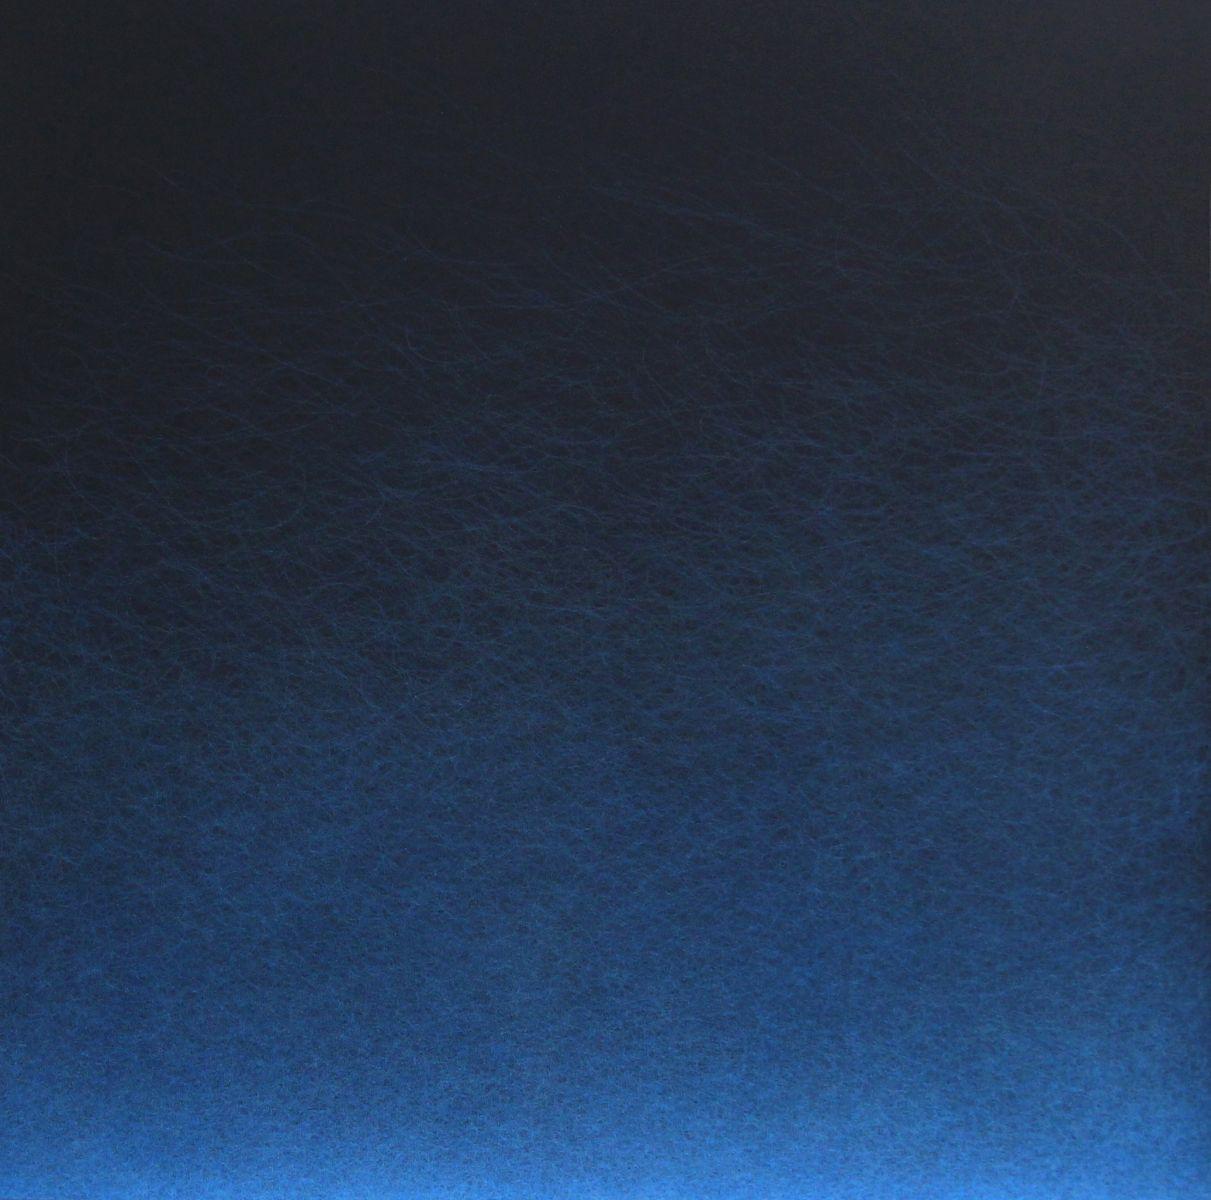 Quantum Entanglement (Phthalo Blue)